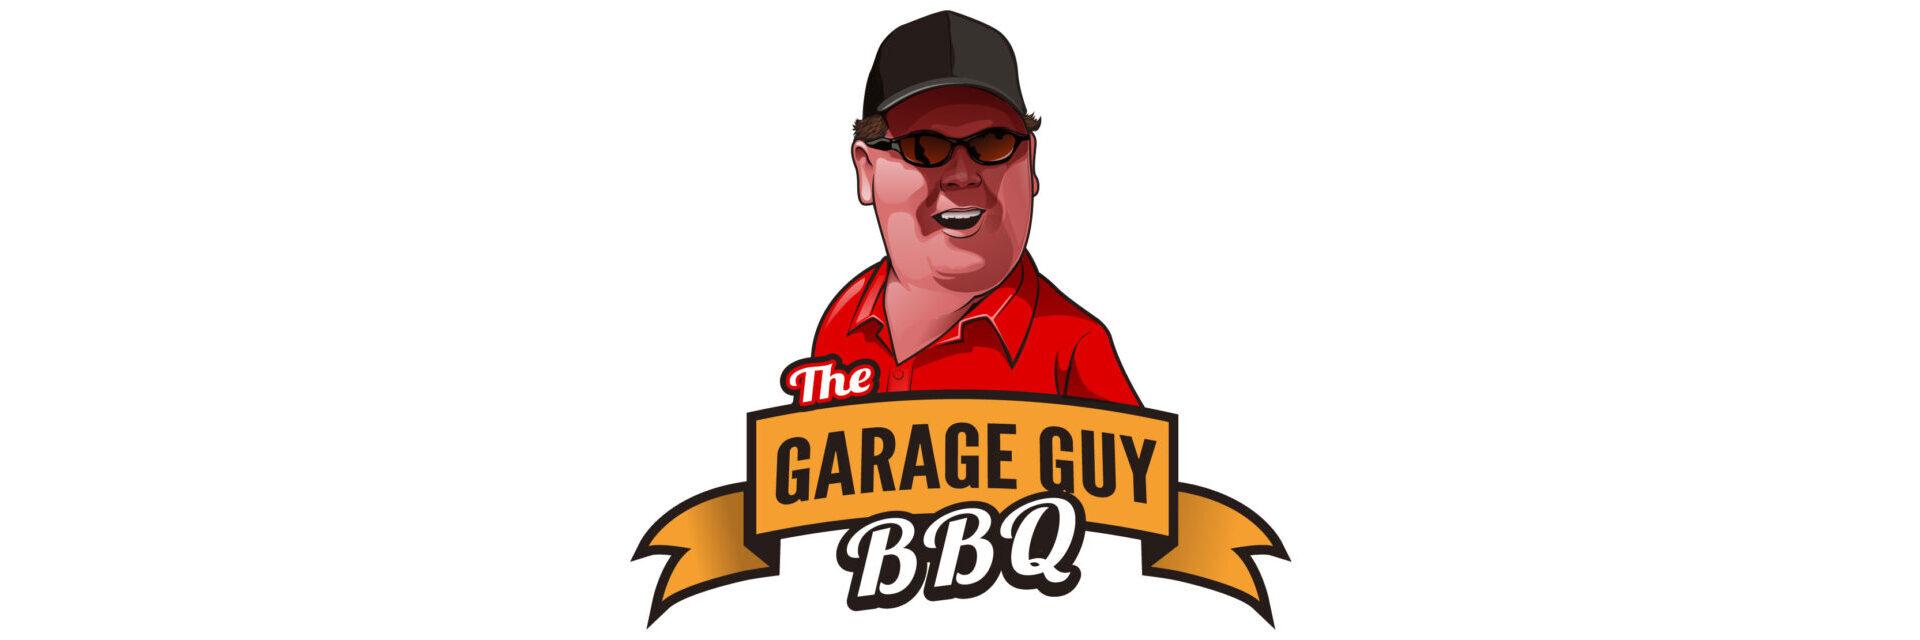 The Garage Guy BBQ